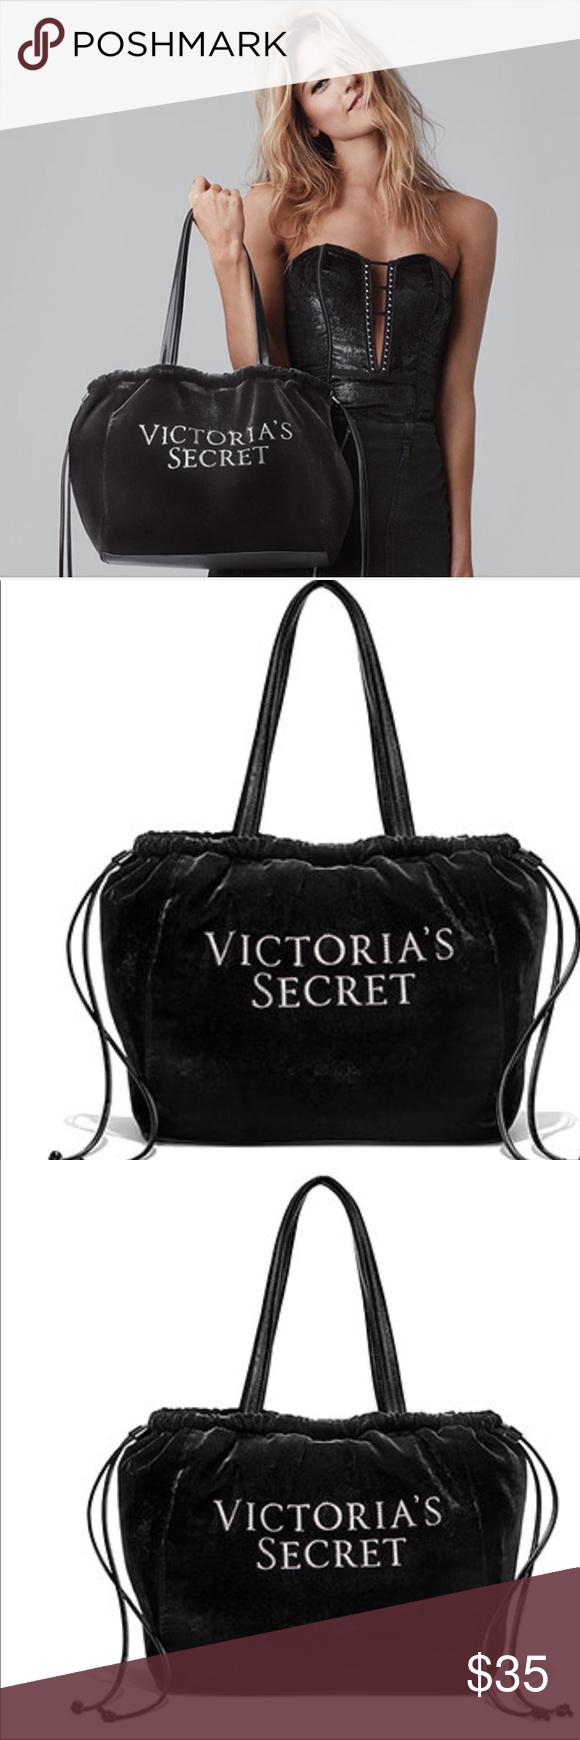 95cd199579 Victoria's Secret Luxe Velvet Tote 2018 Velour Bag NEW! Victoria's Secret  Luxe Velvet Tote 2018